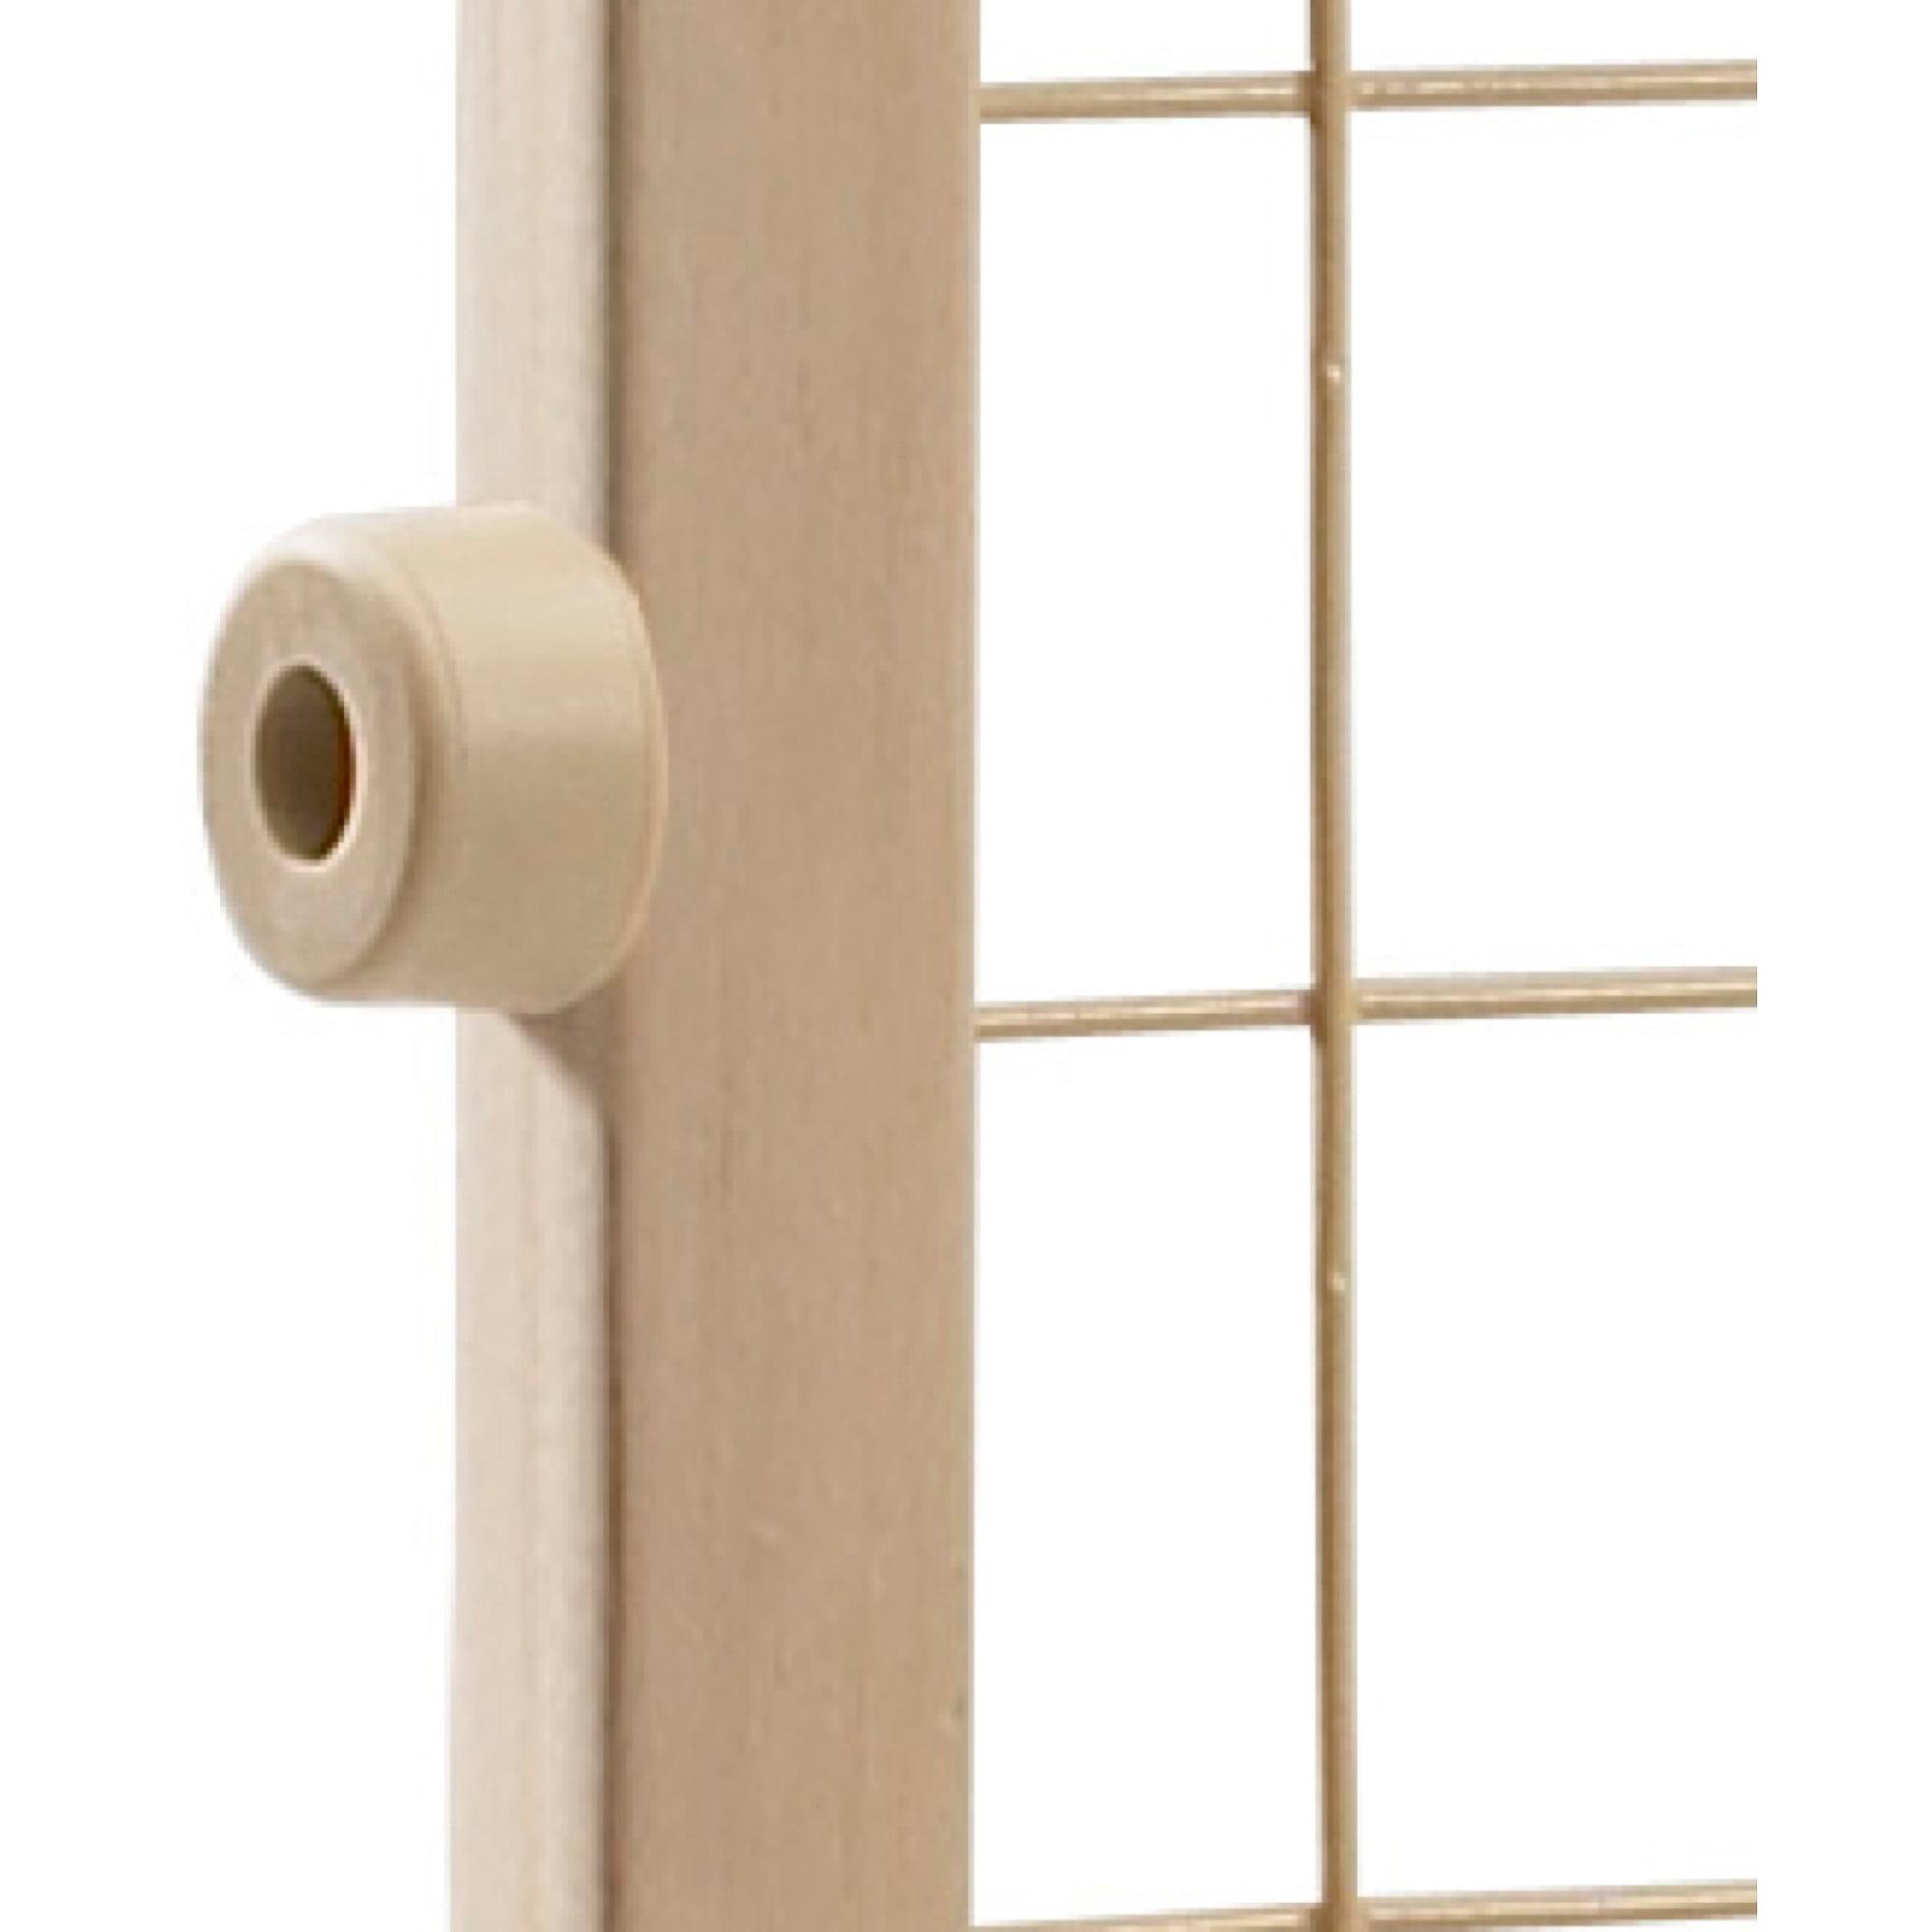 Evenflo - Position & Lock Tall Gate